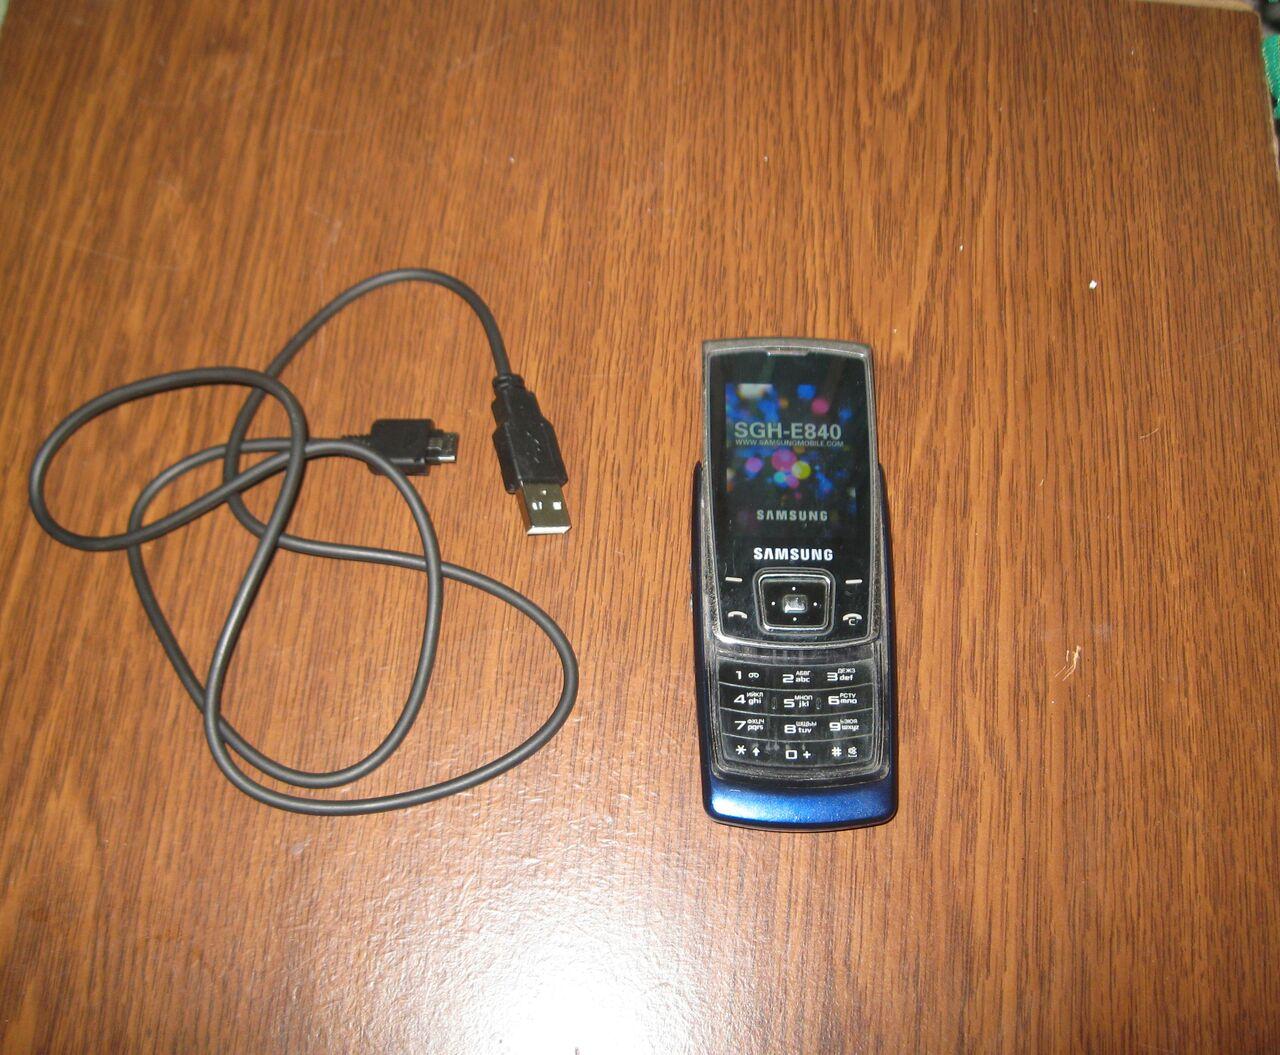 Bajar fotos de celular samsung sgh-x636 35